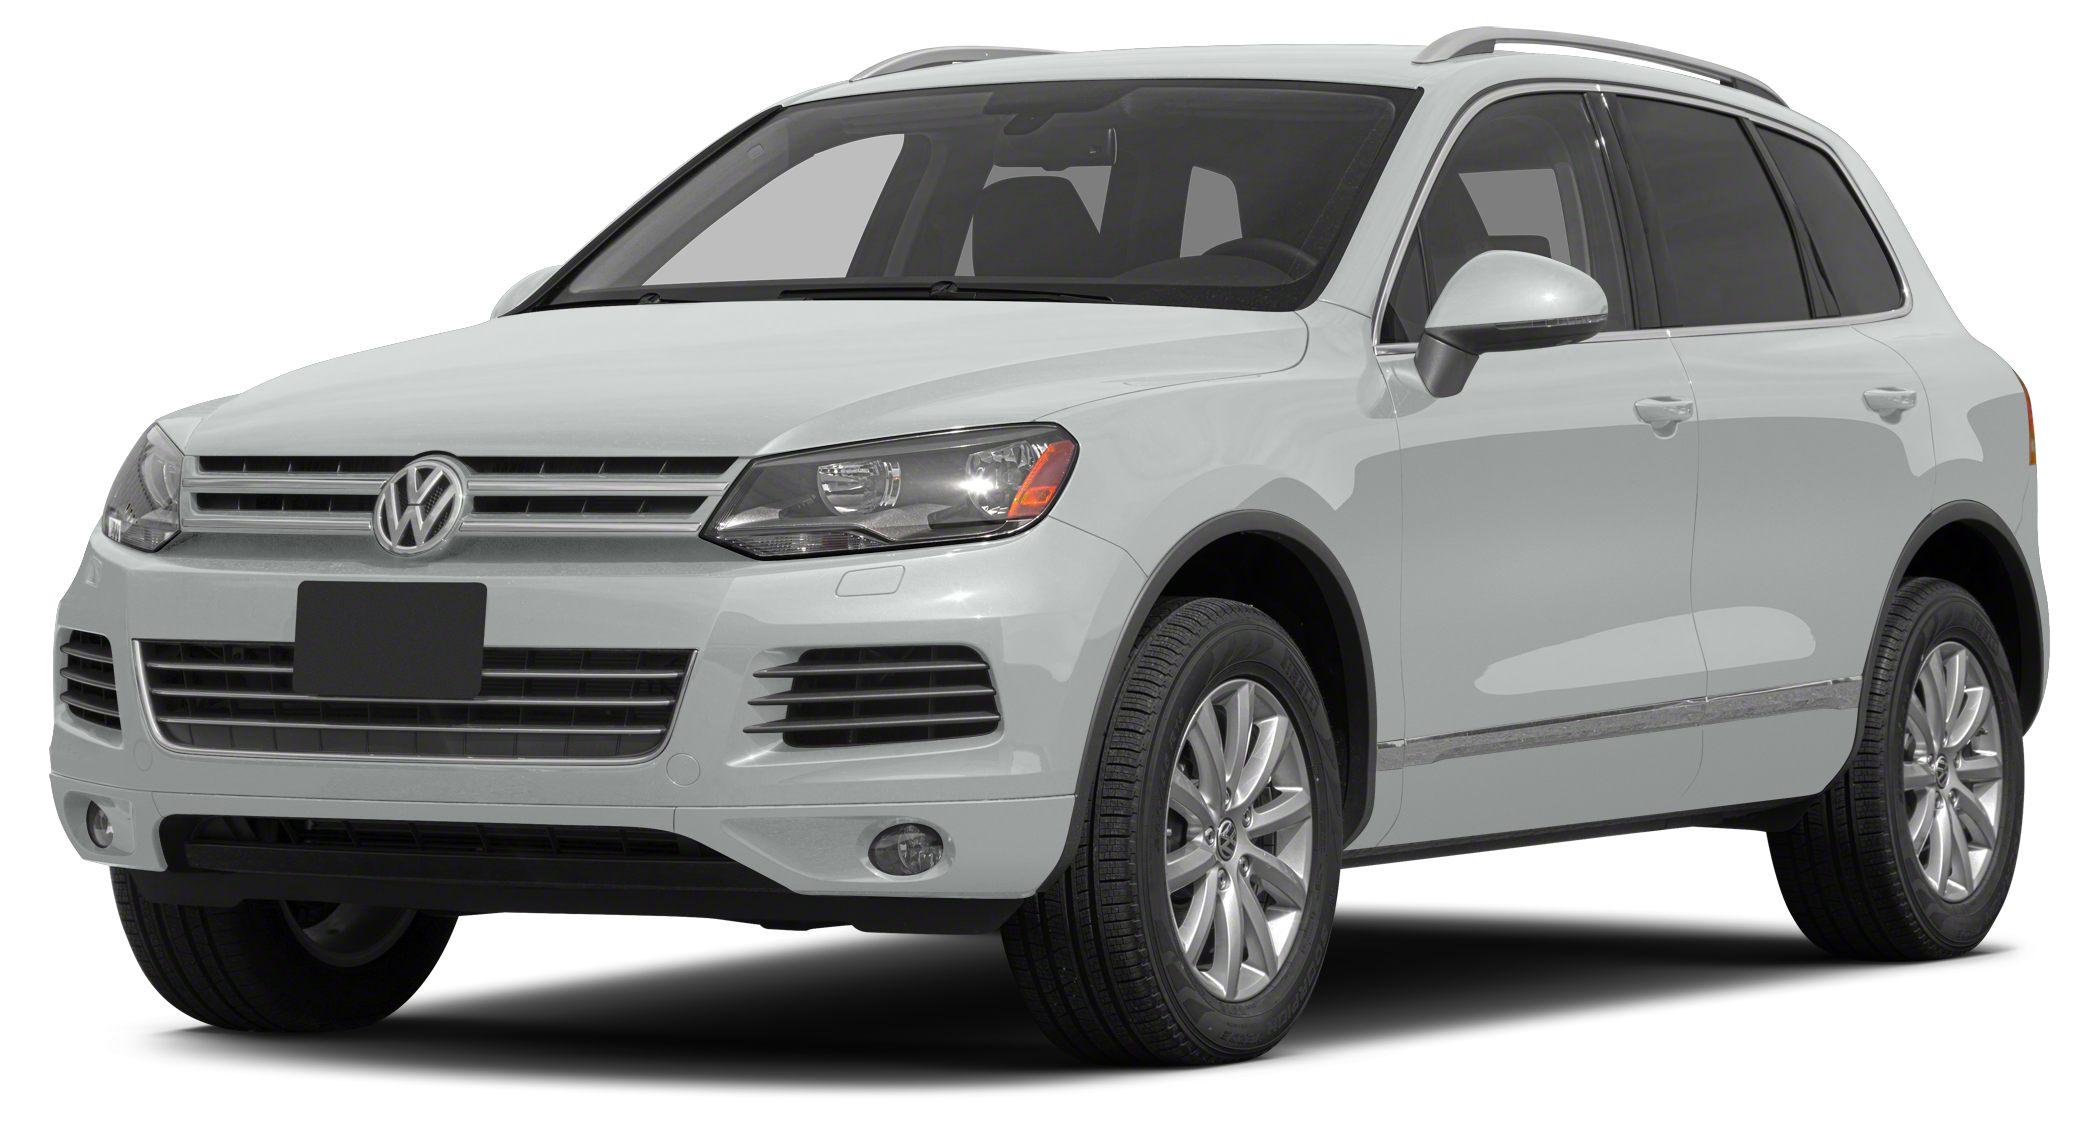 2014 Volkswagen Touareg TDI Sport CONLEY CERTIFIED 3 Month  3000 Mile Limited Warranty